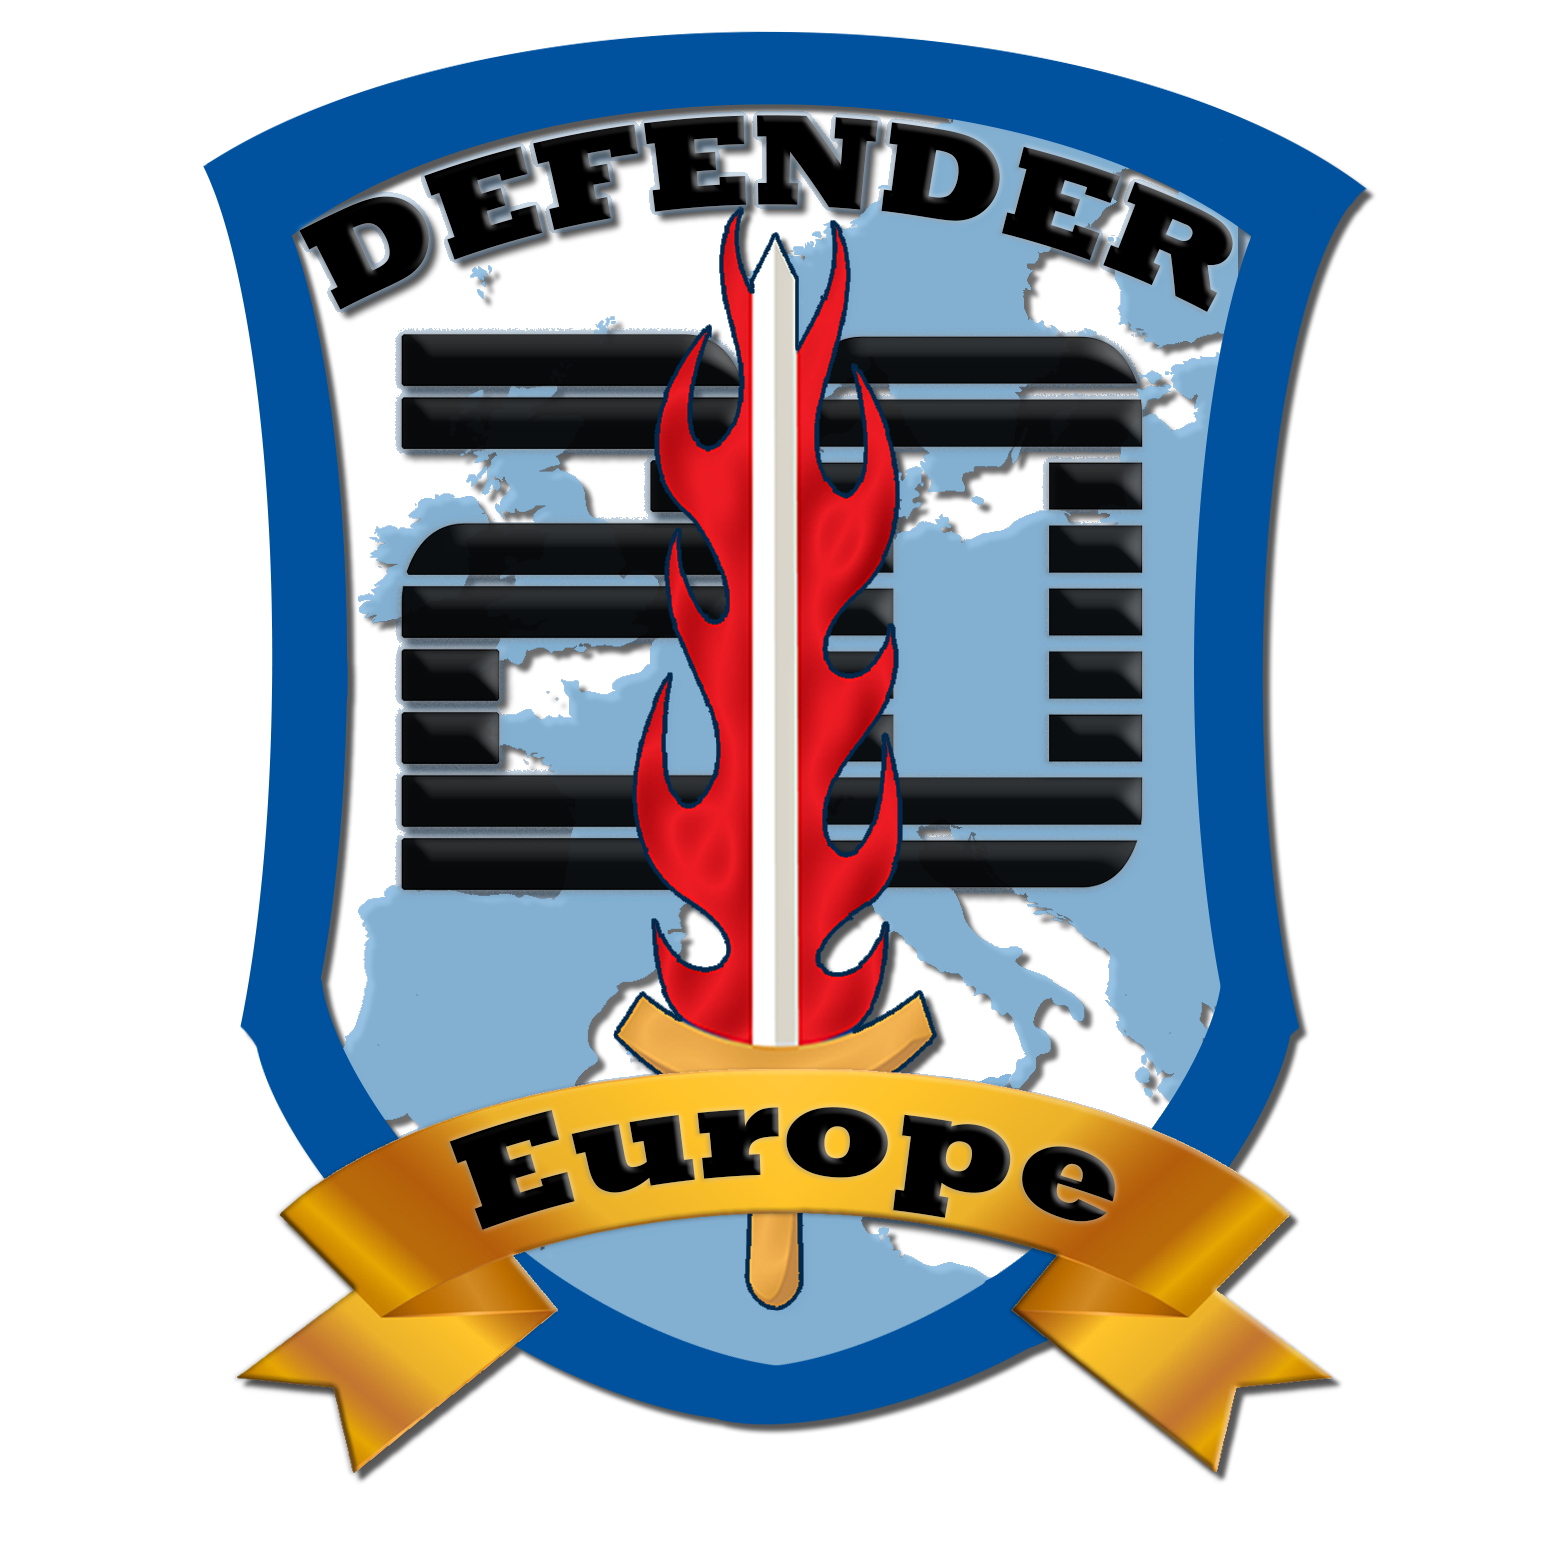 ideologee: Coronavirus is attack on Defender-Europe ...